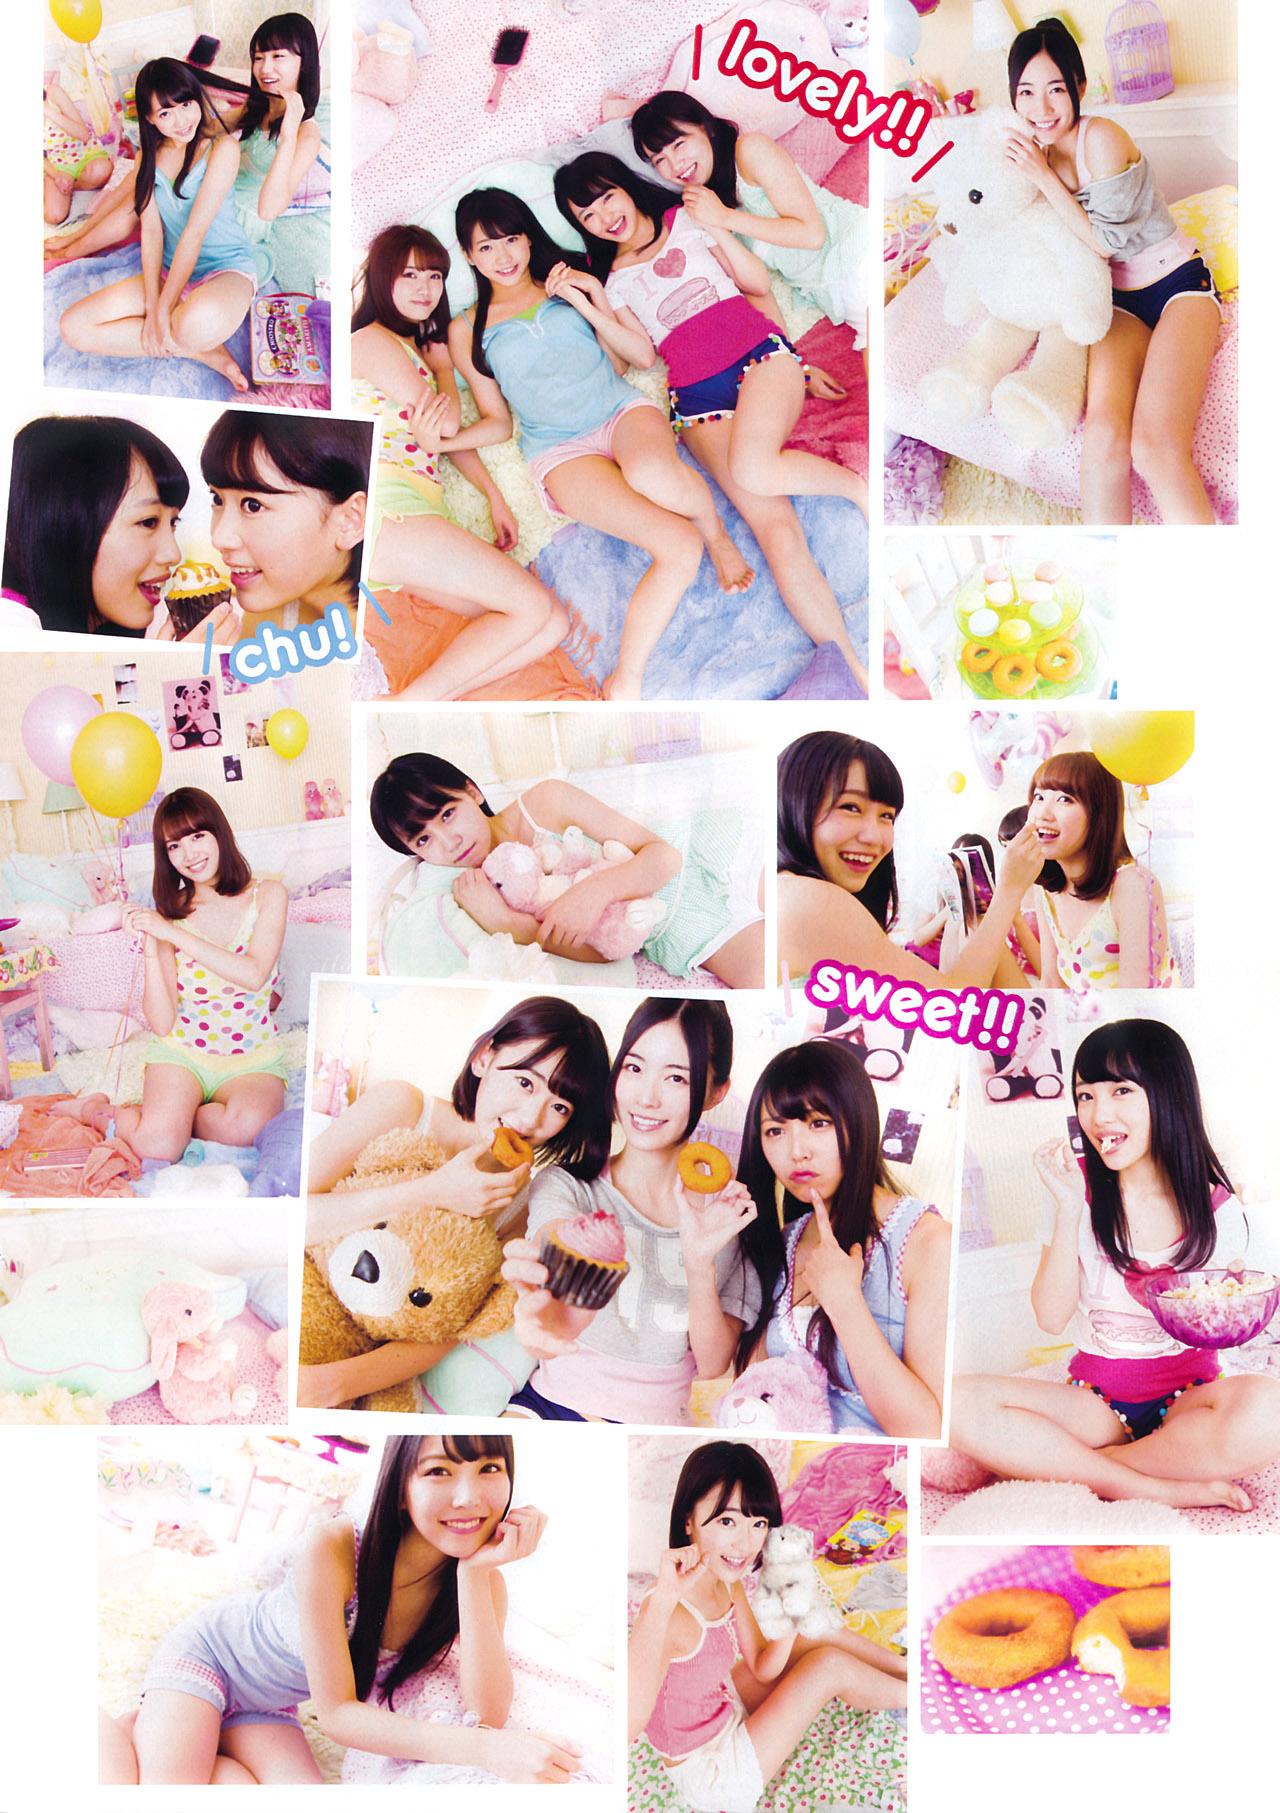 AKB48 WPB 141210 09.jpg